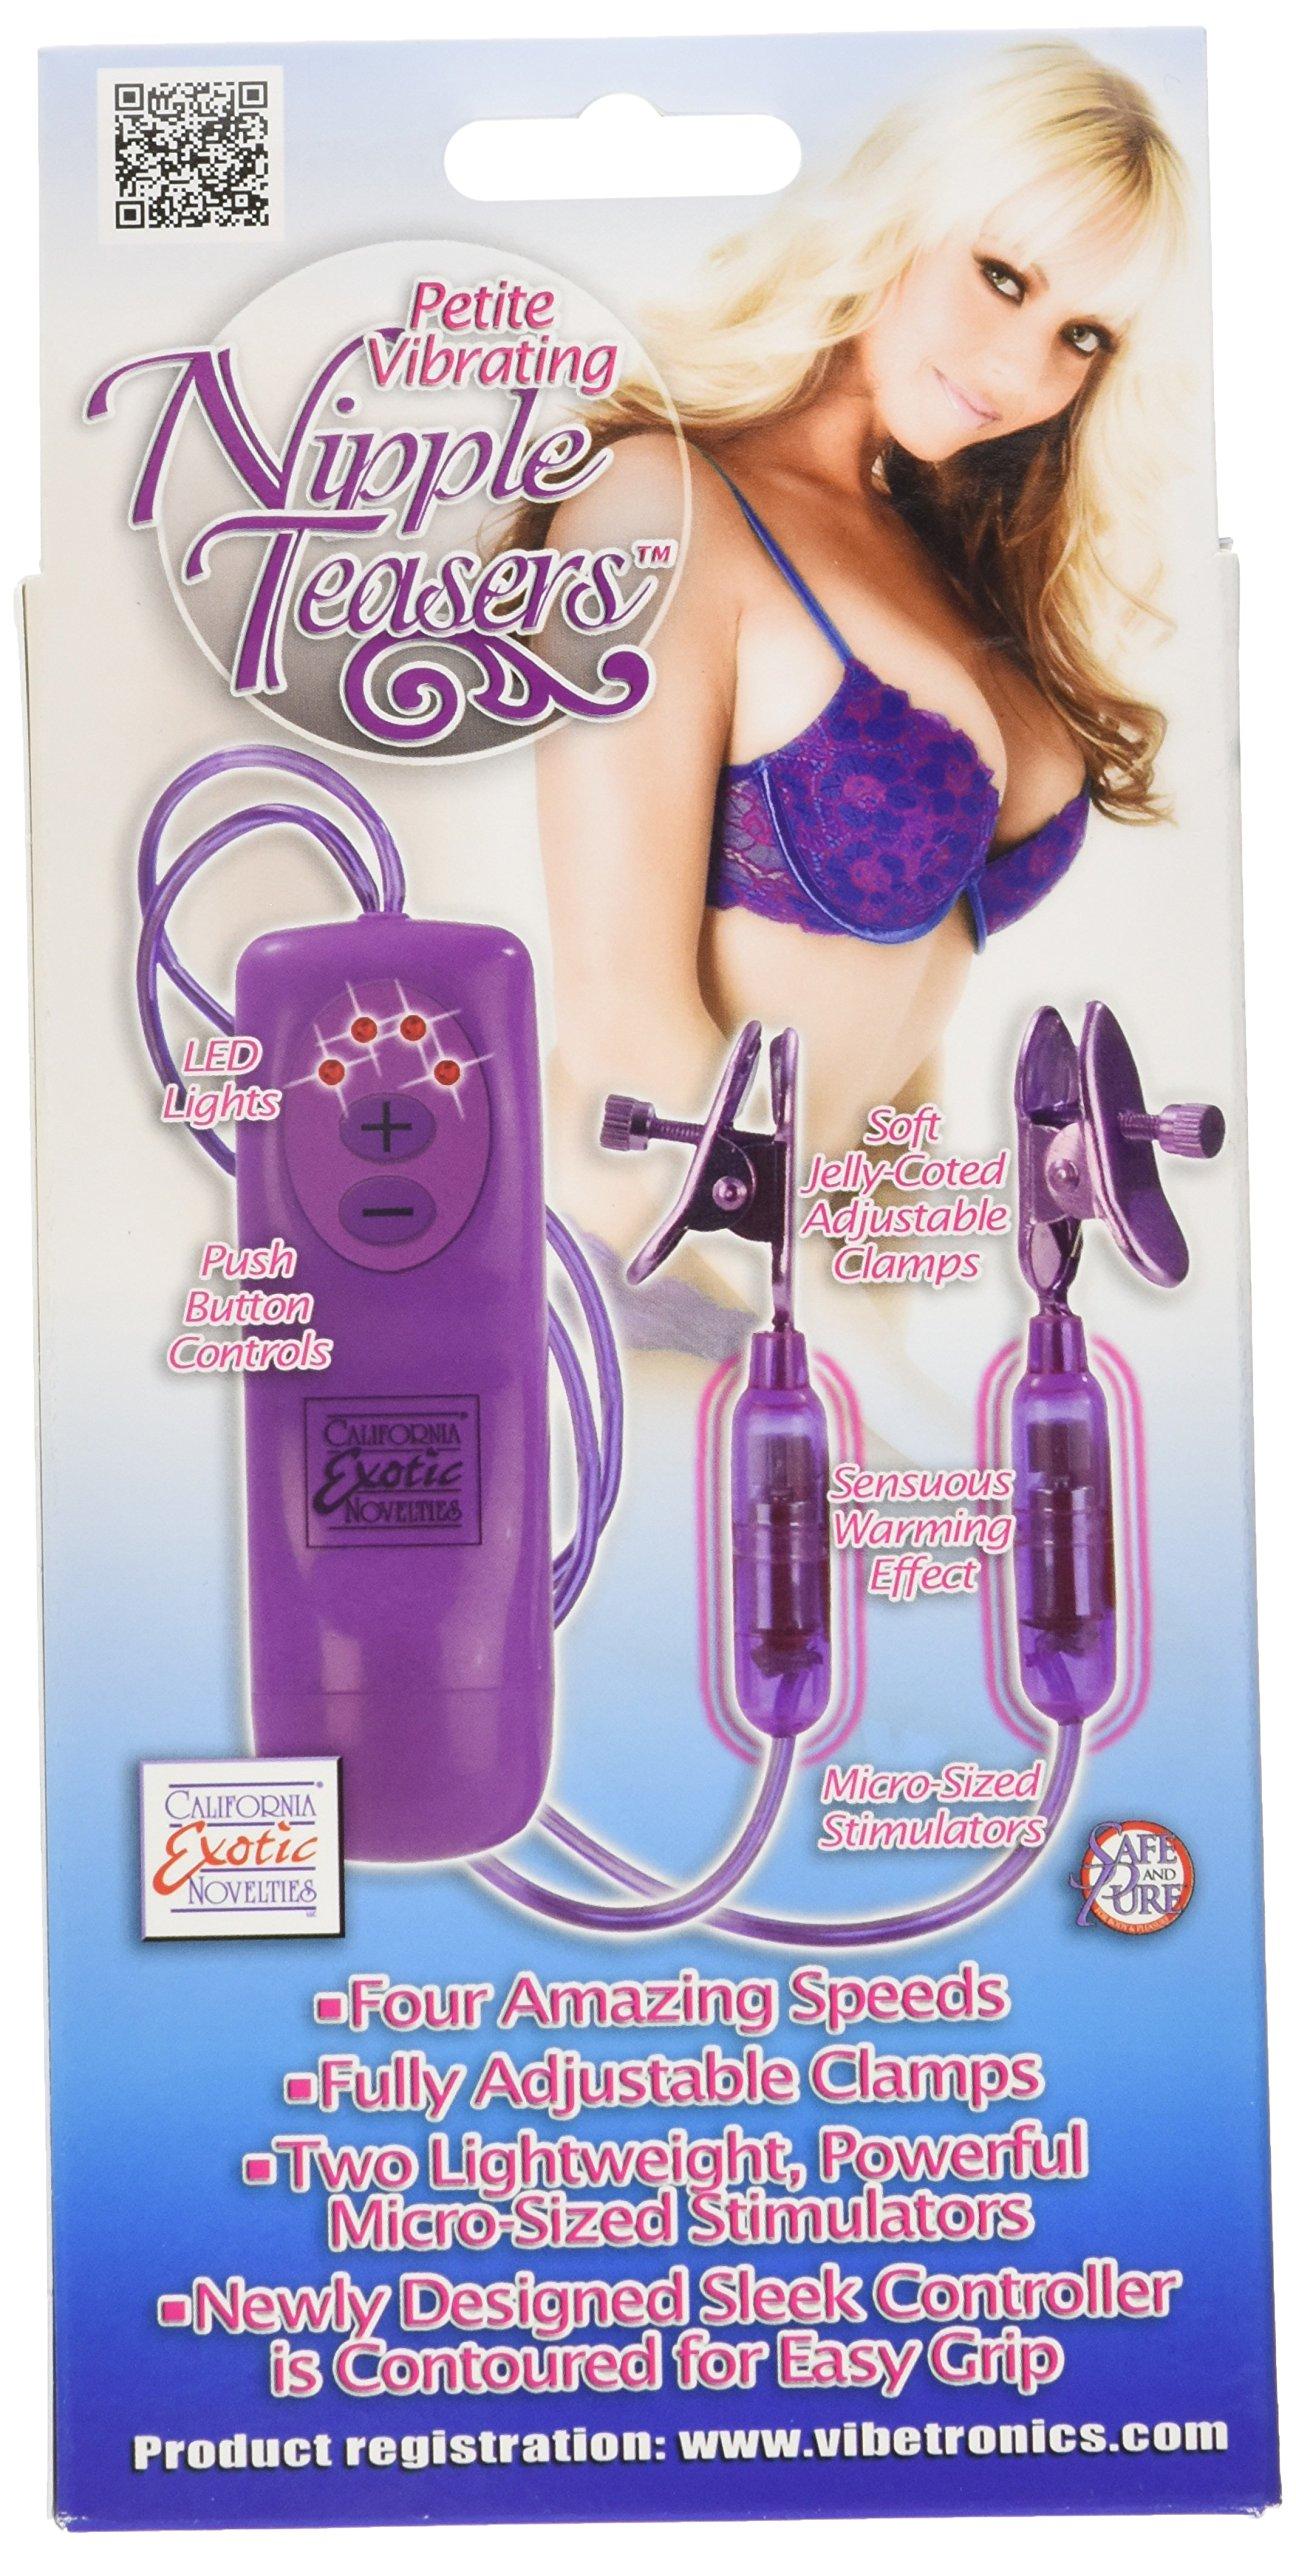 California Exotic Novelties Petite Vibrating Nipple Teasers